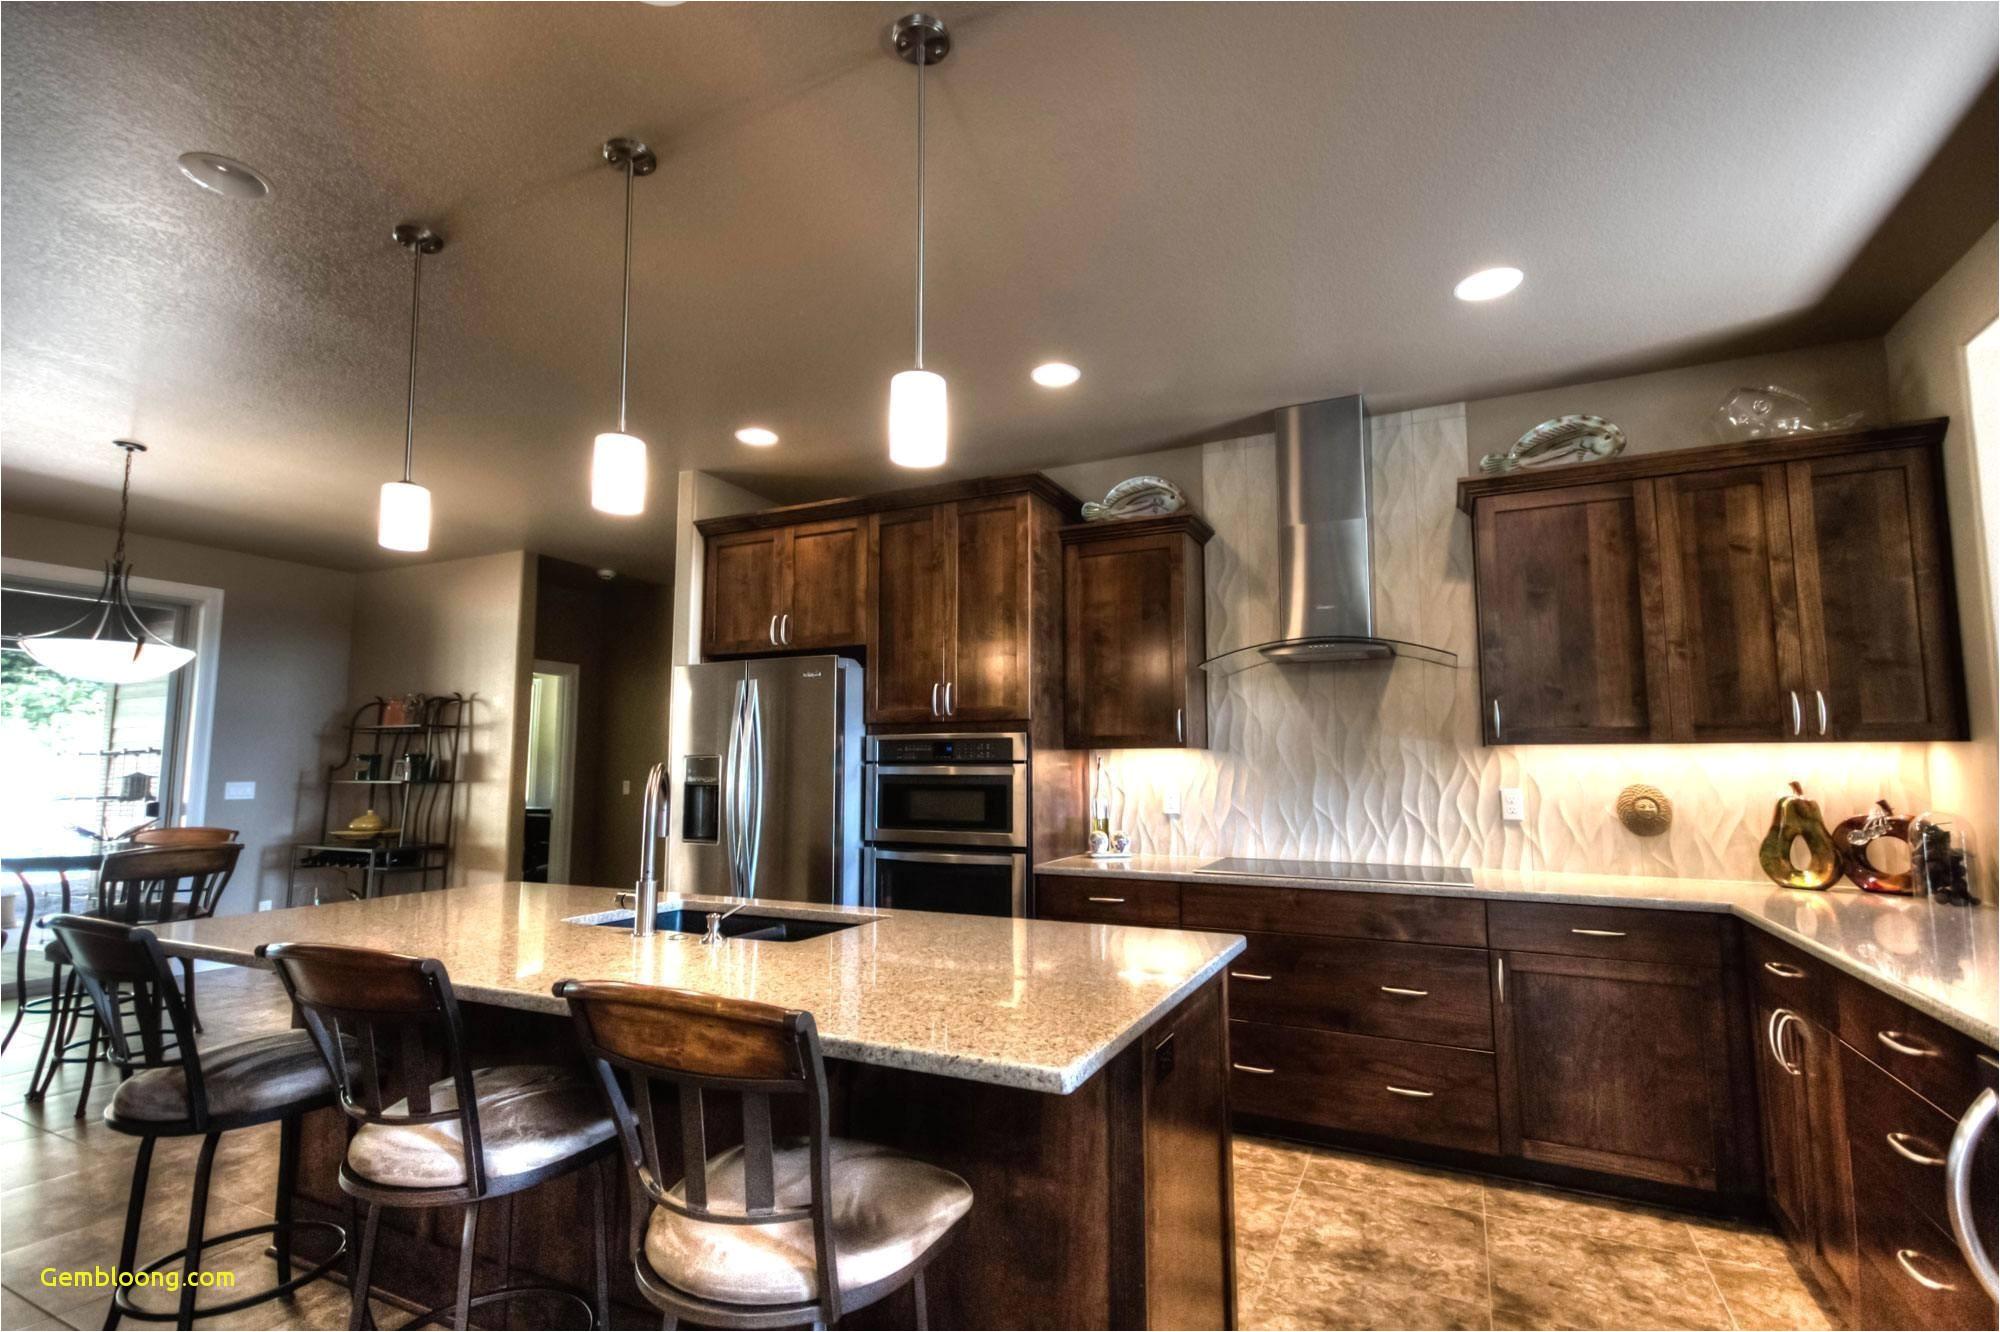 2015 4 bedroom house plans 7 mark stewart master plan 24 m 2040 od inspiration towards